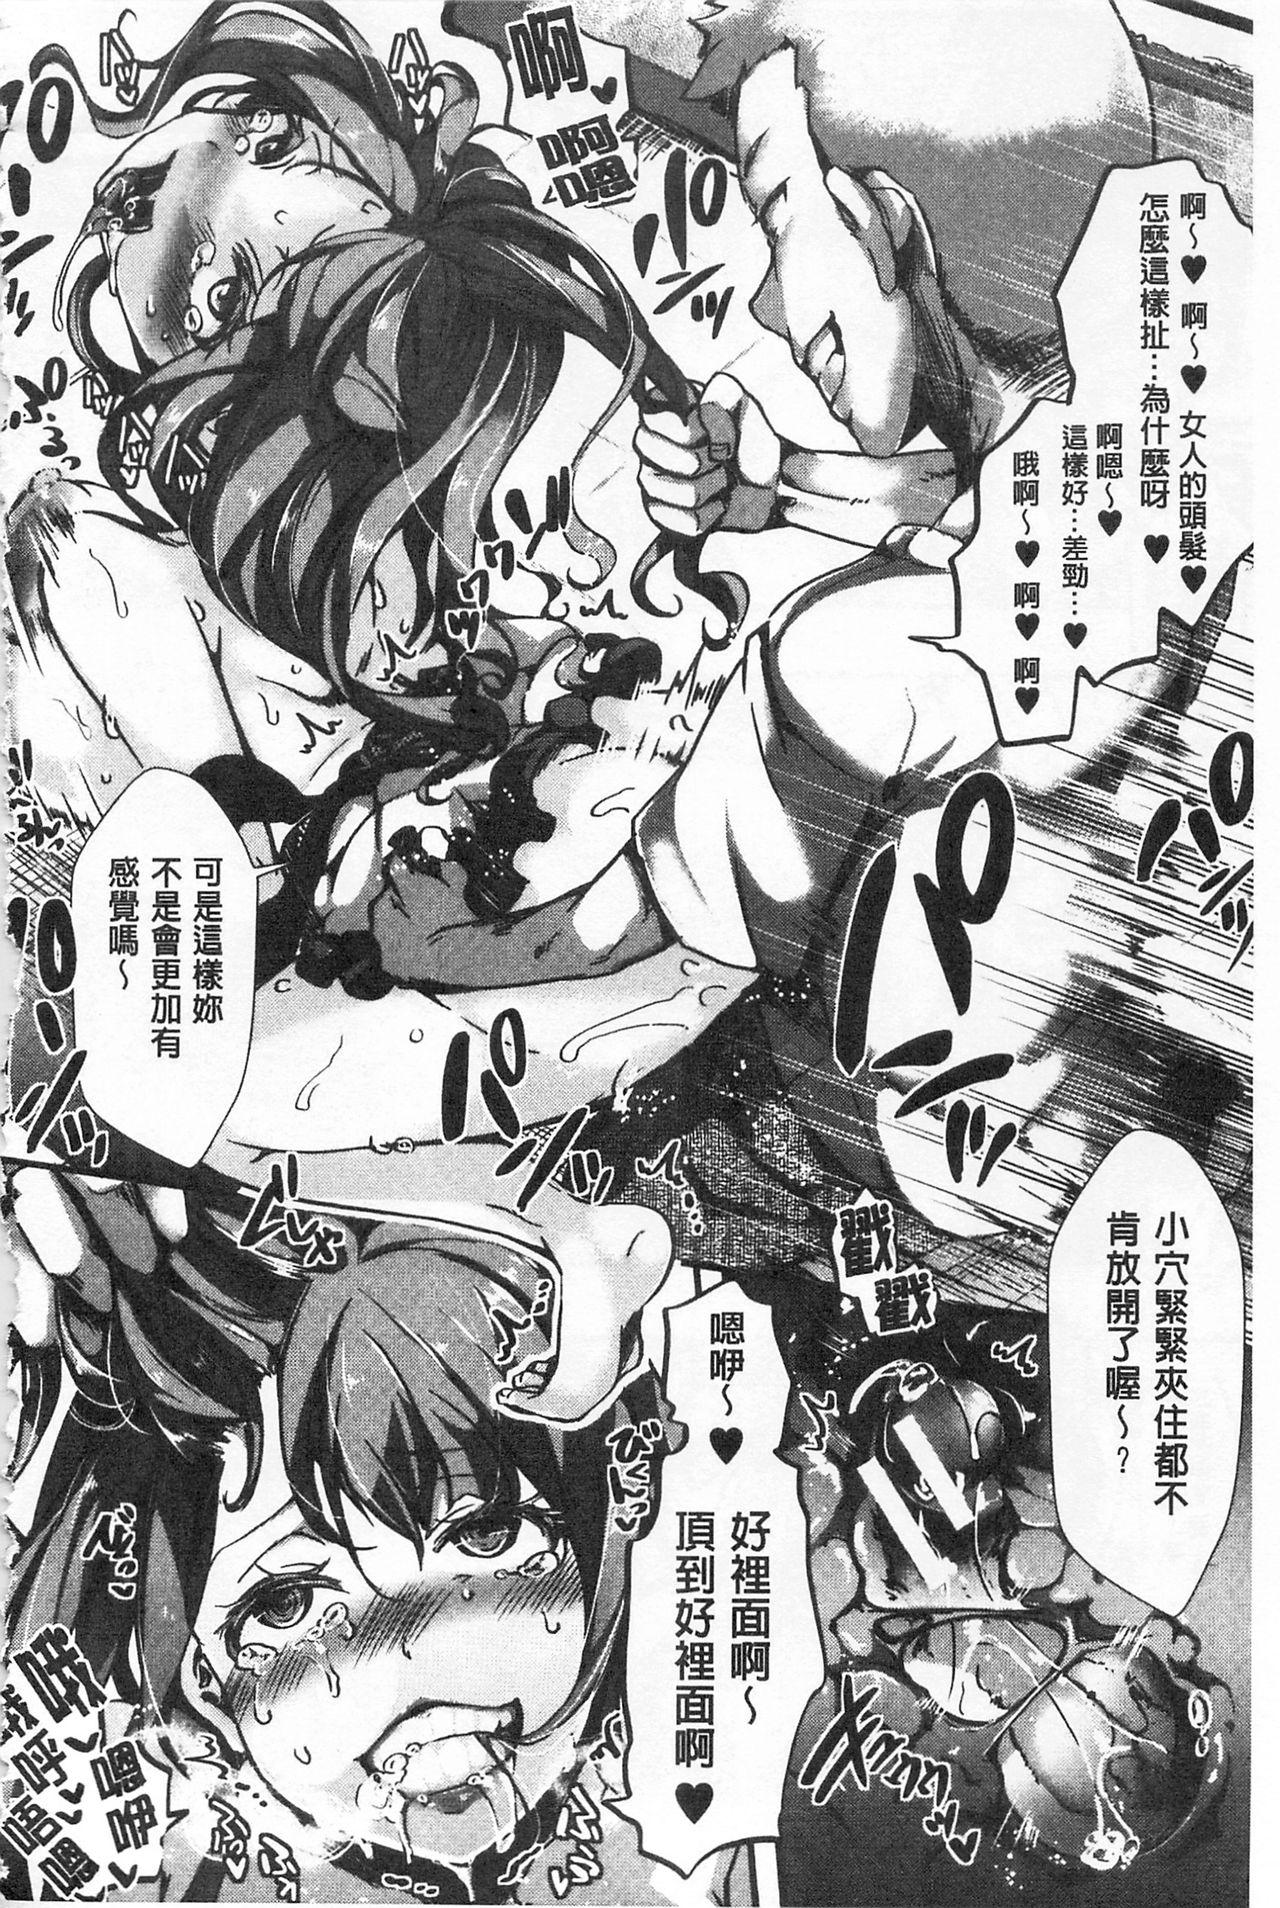 [hal] Daienjou -Ikare Ikasare Iki Ikare-   ∞艶嬢 -洩出來被搞到洩掛了被搞掛-  [Chinese] 45